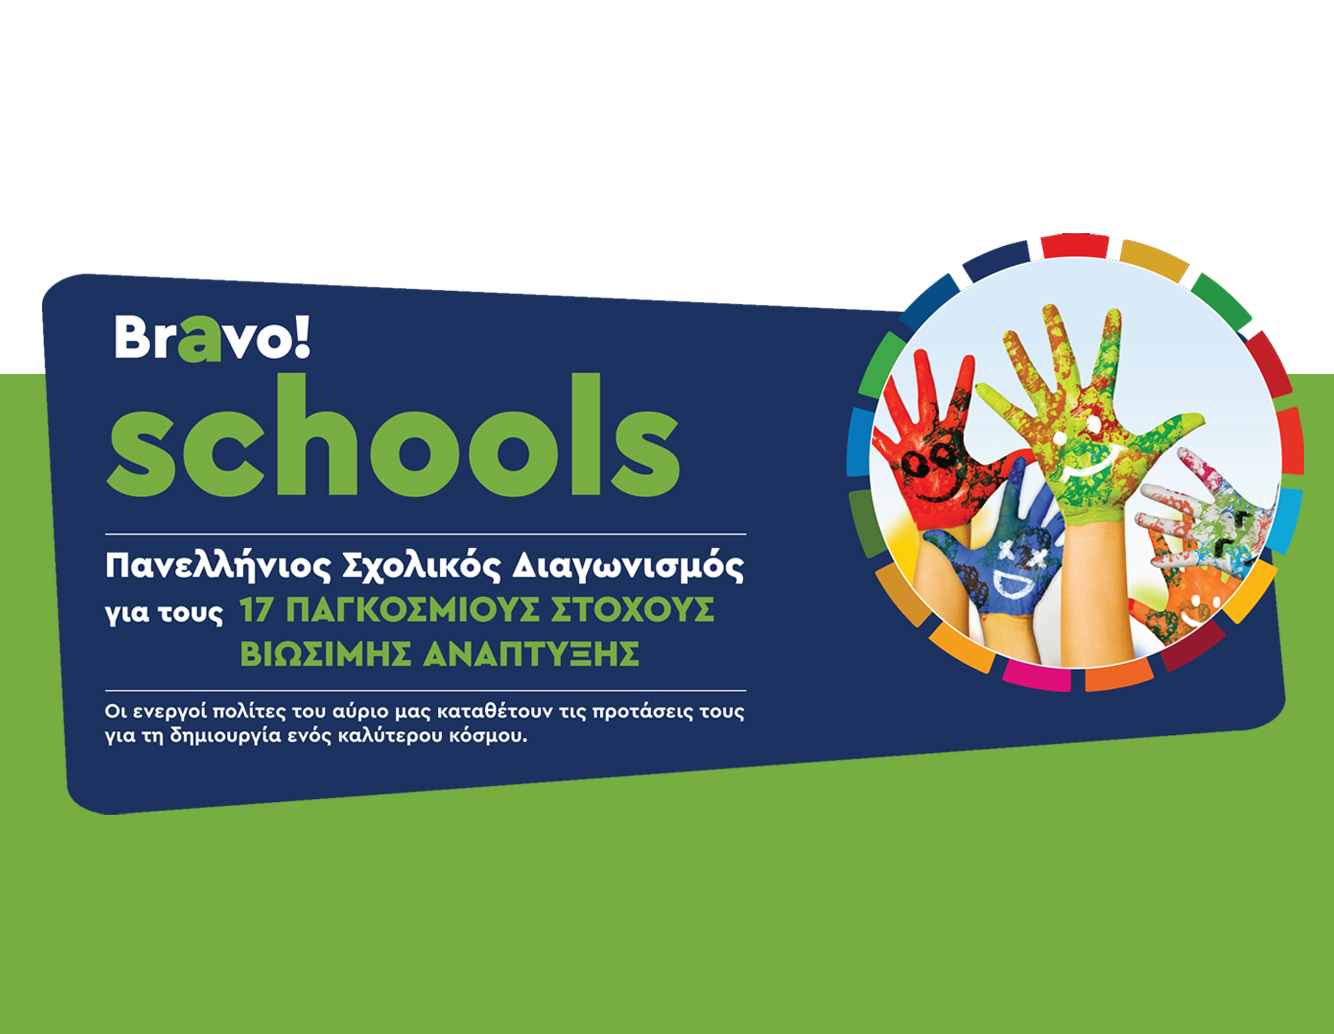 Bravo Schools Bravo Schools